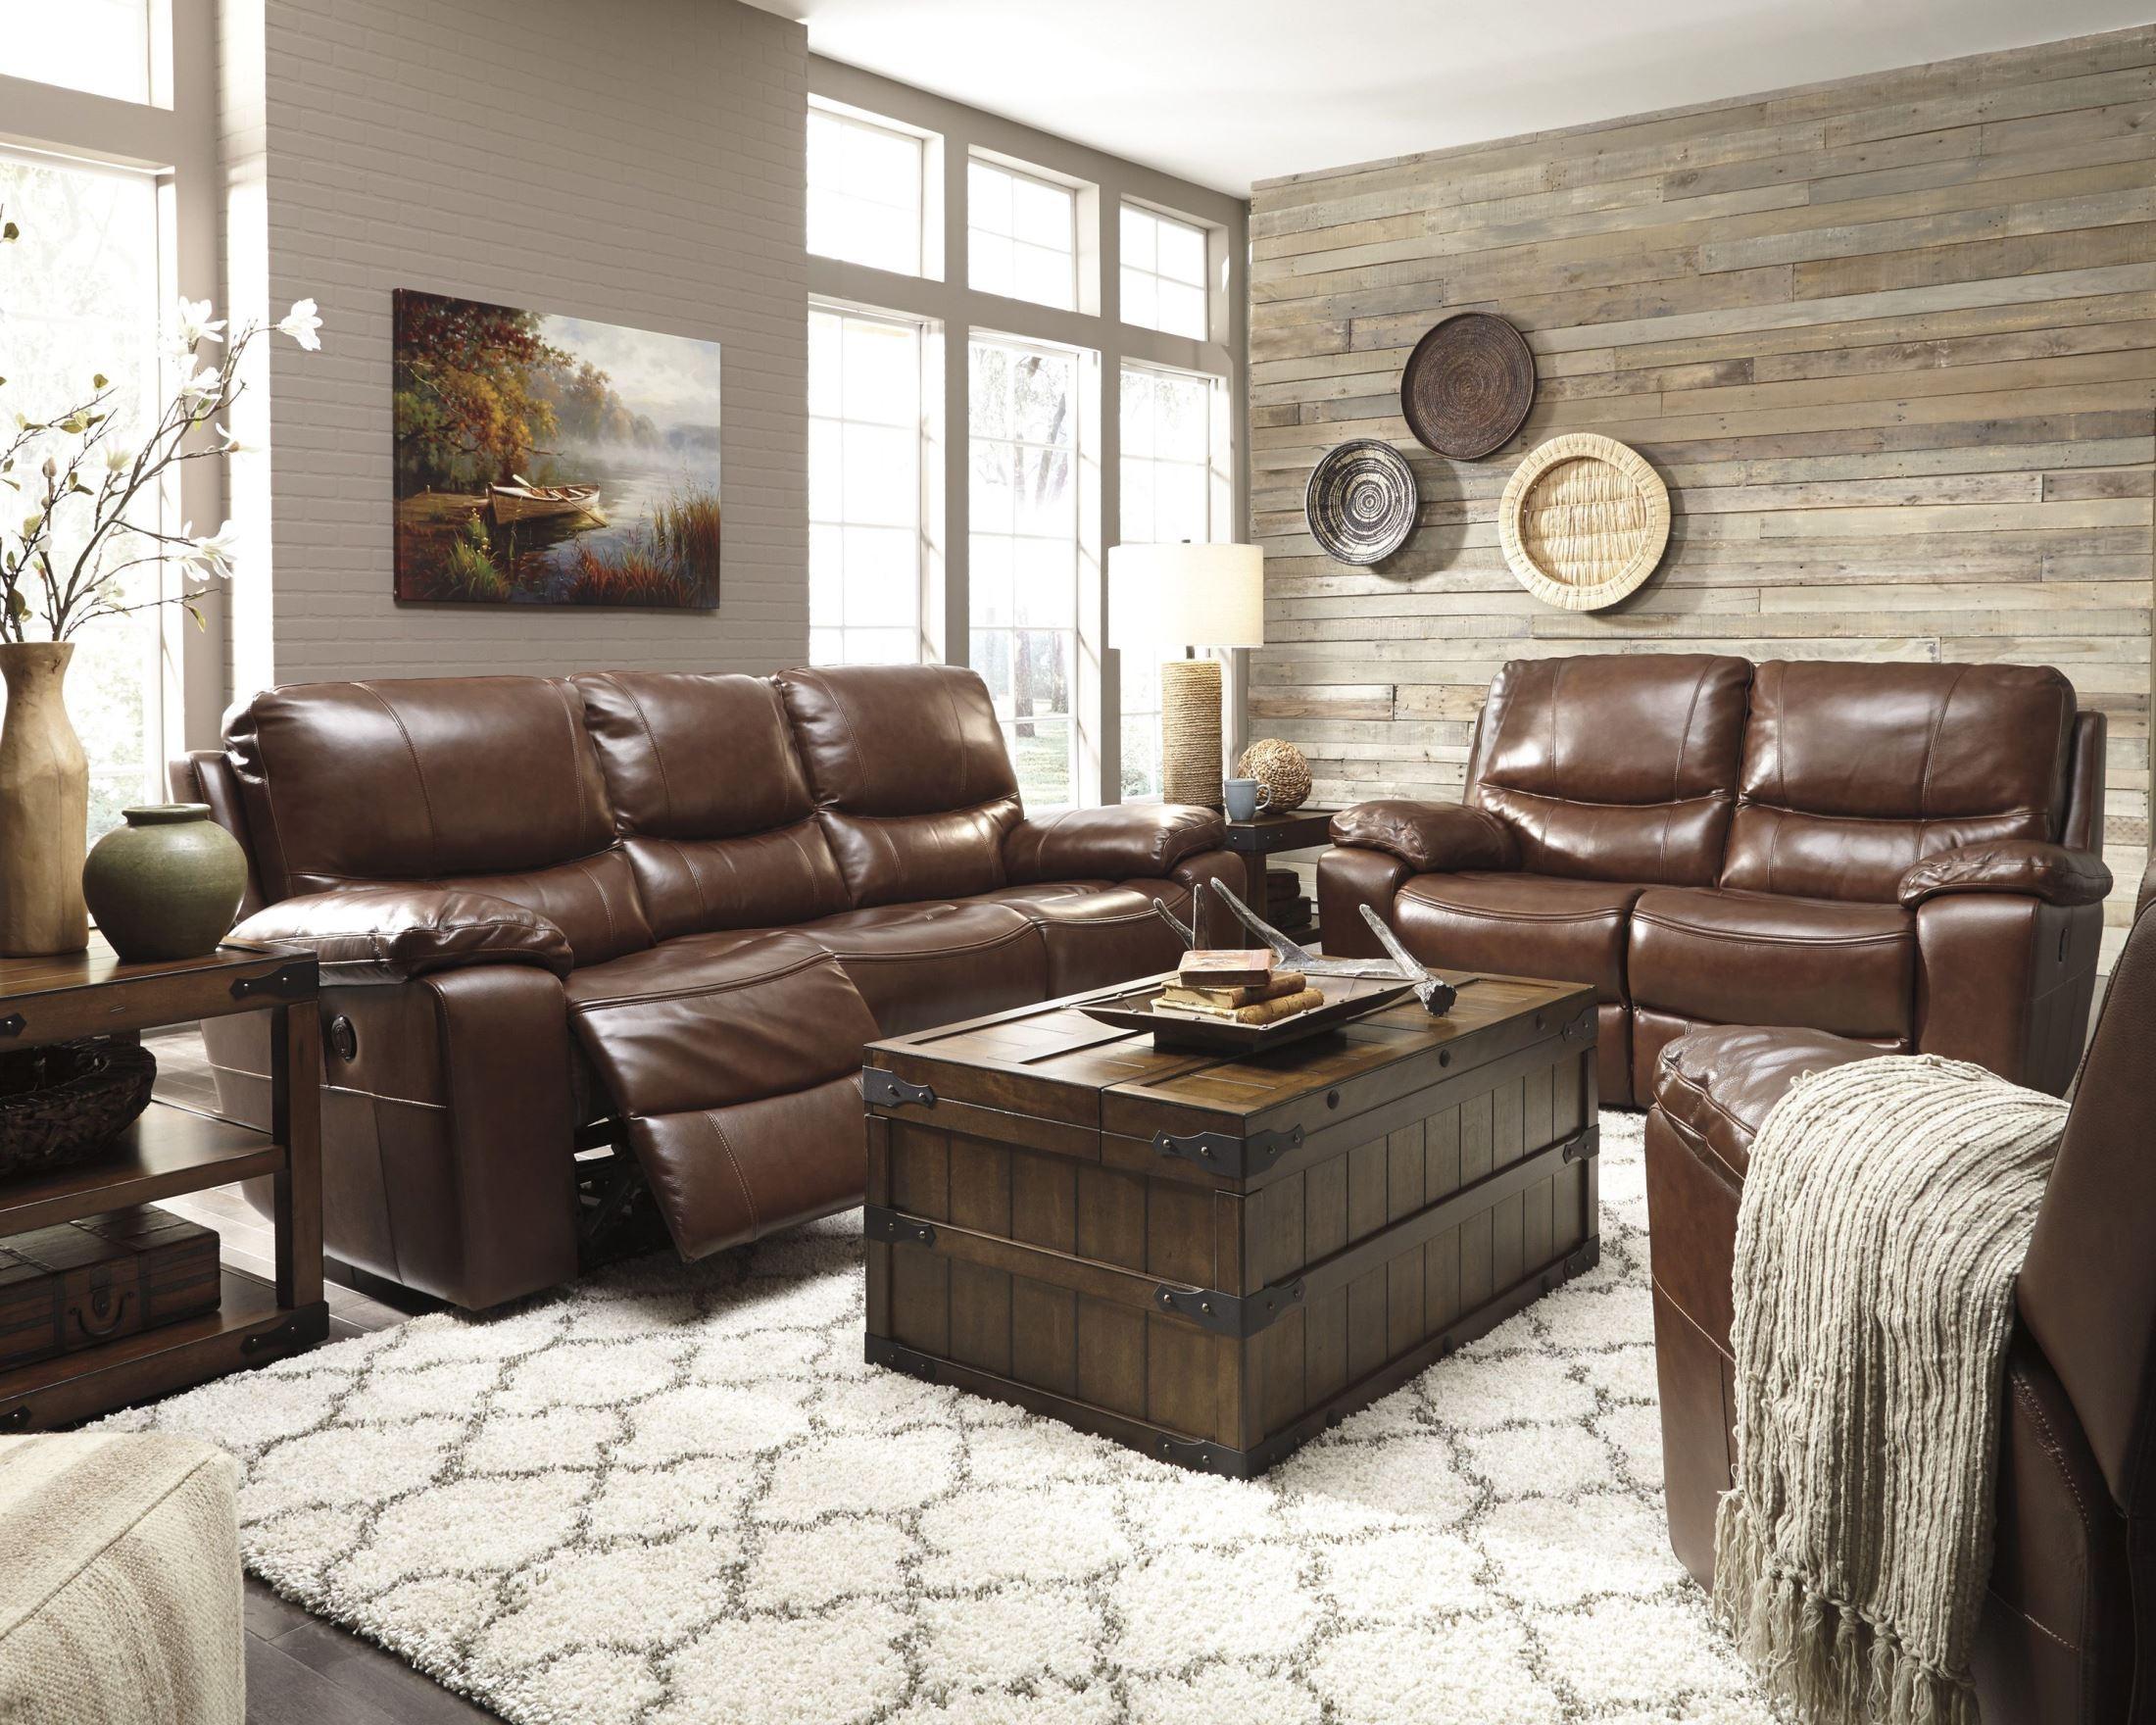 panache sofa set black two person penache saddle power reclining loveseat from ashley